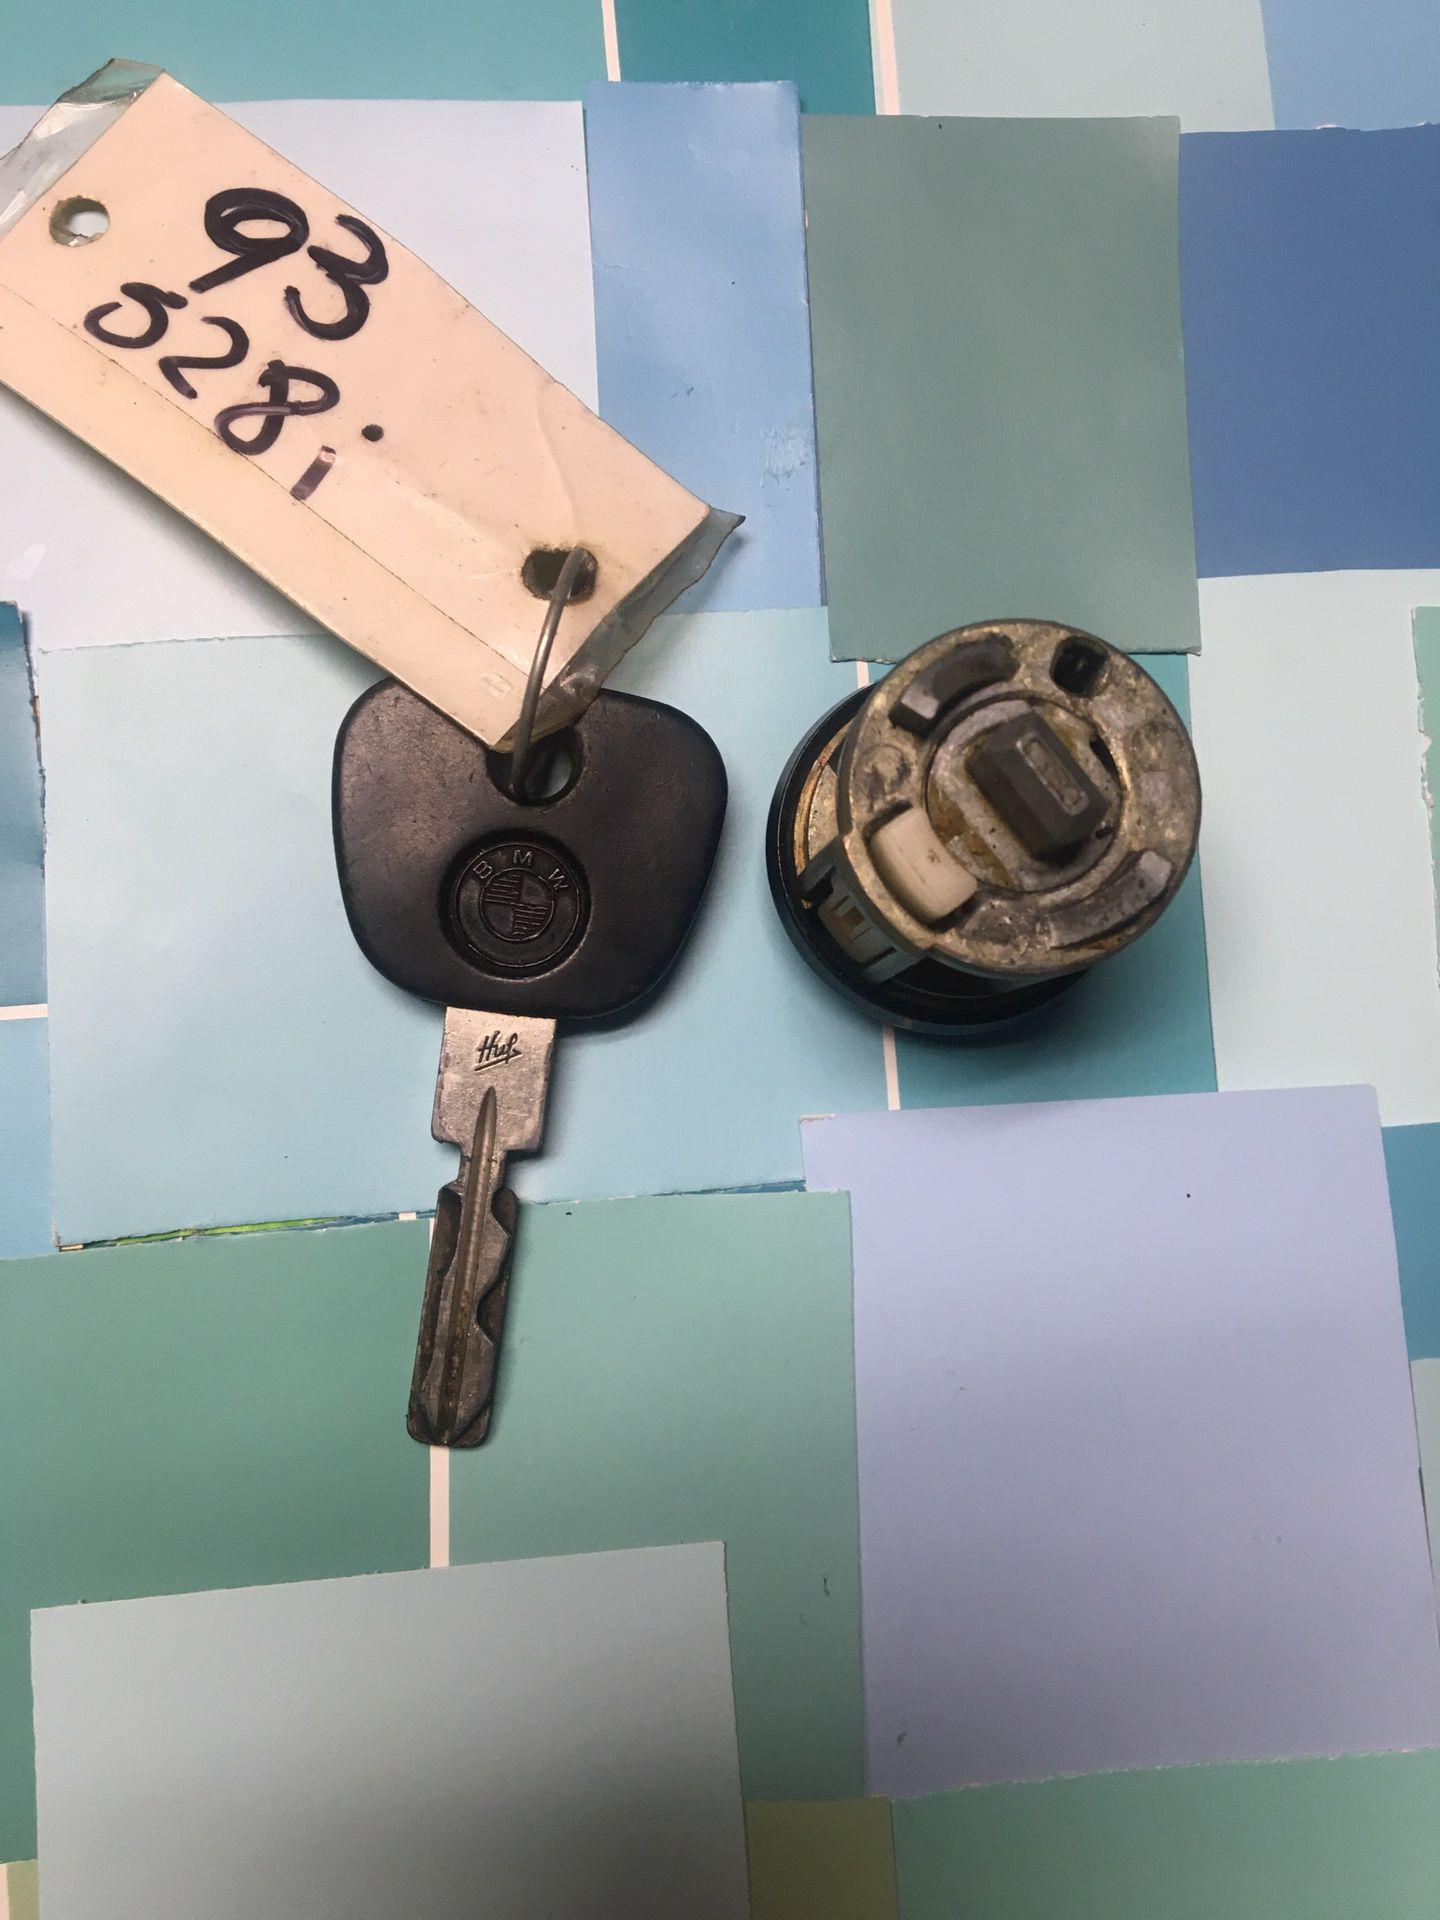 OEM 1993 BMW 528i Key And Tumbler Set